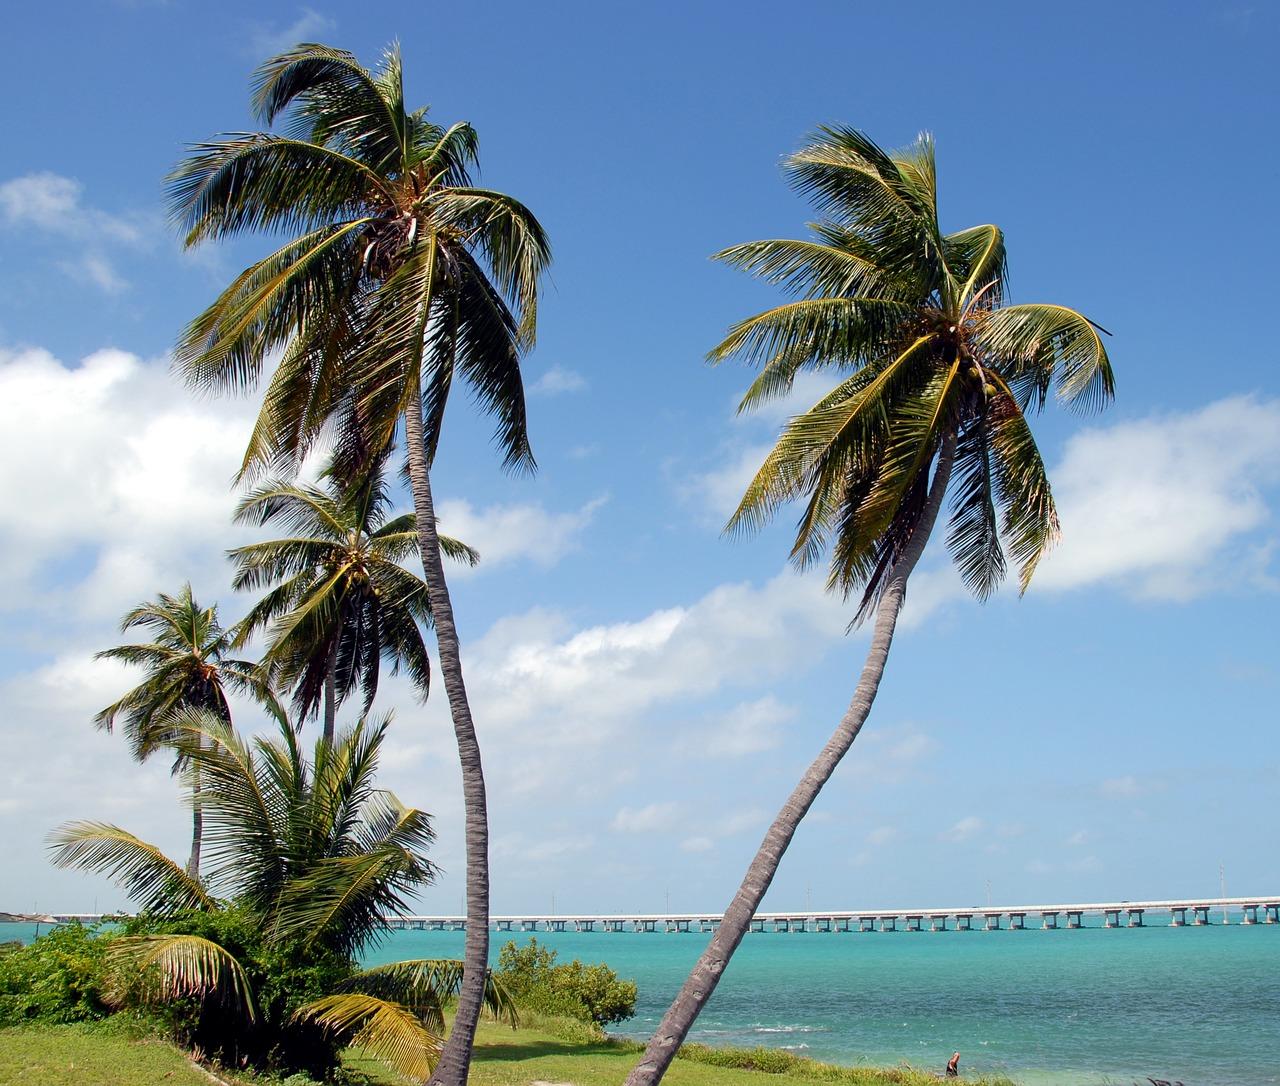 Bahia Honda State Park | Public Domain/Pixabay